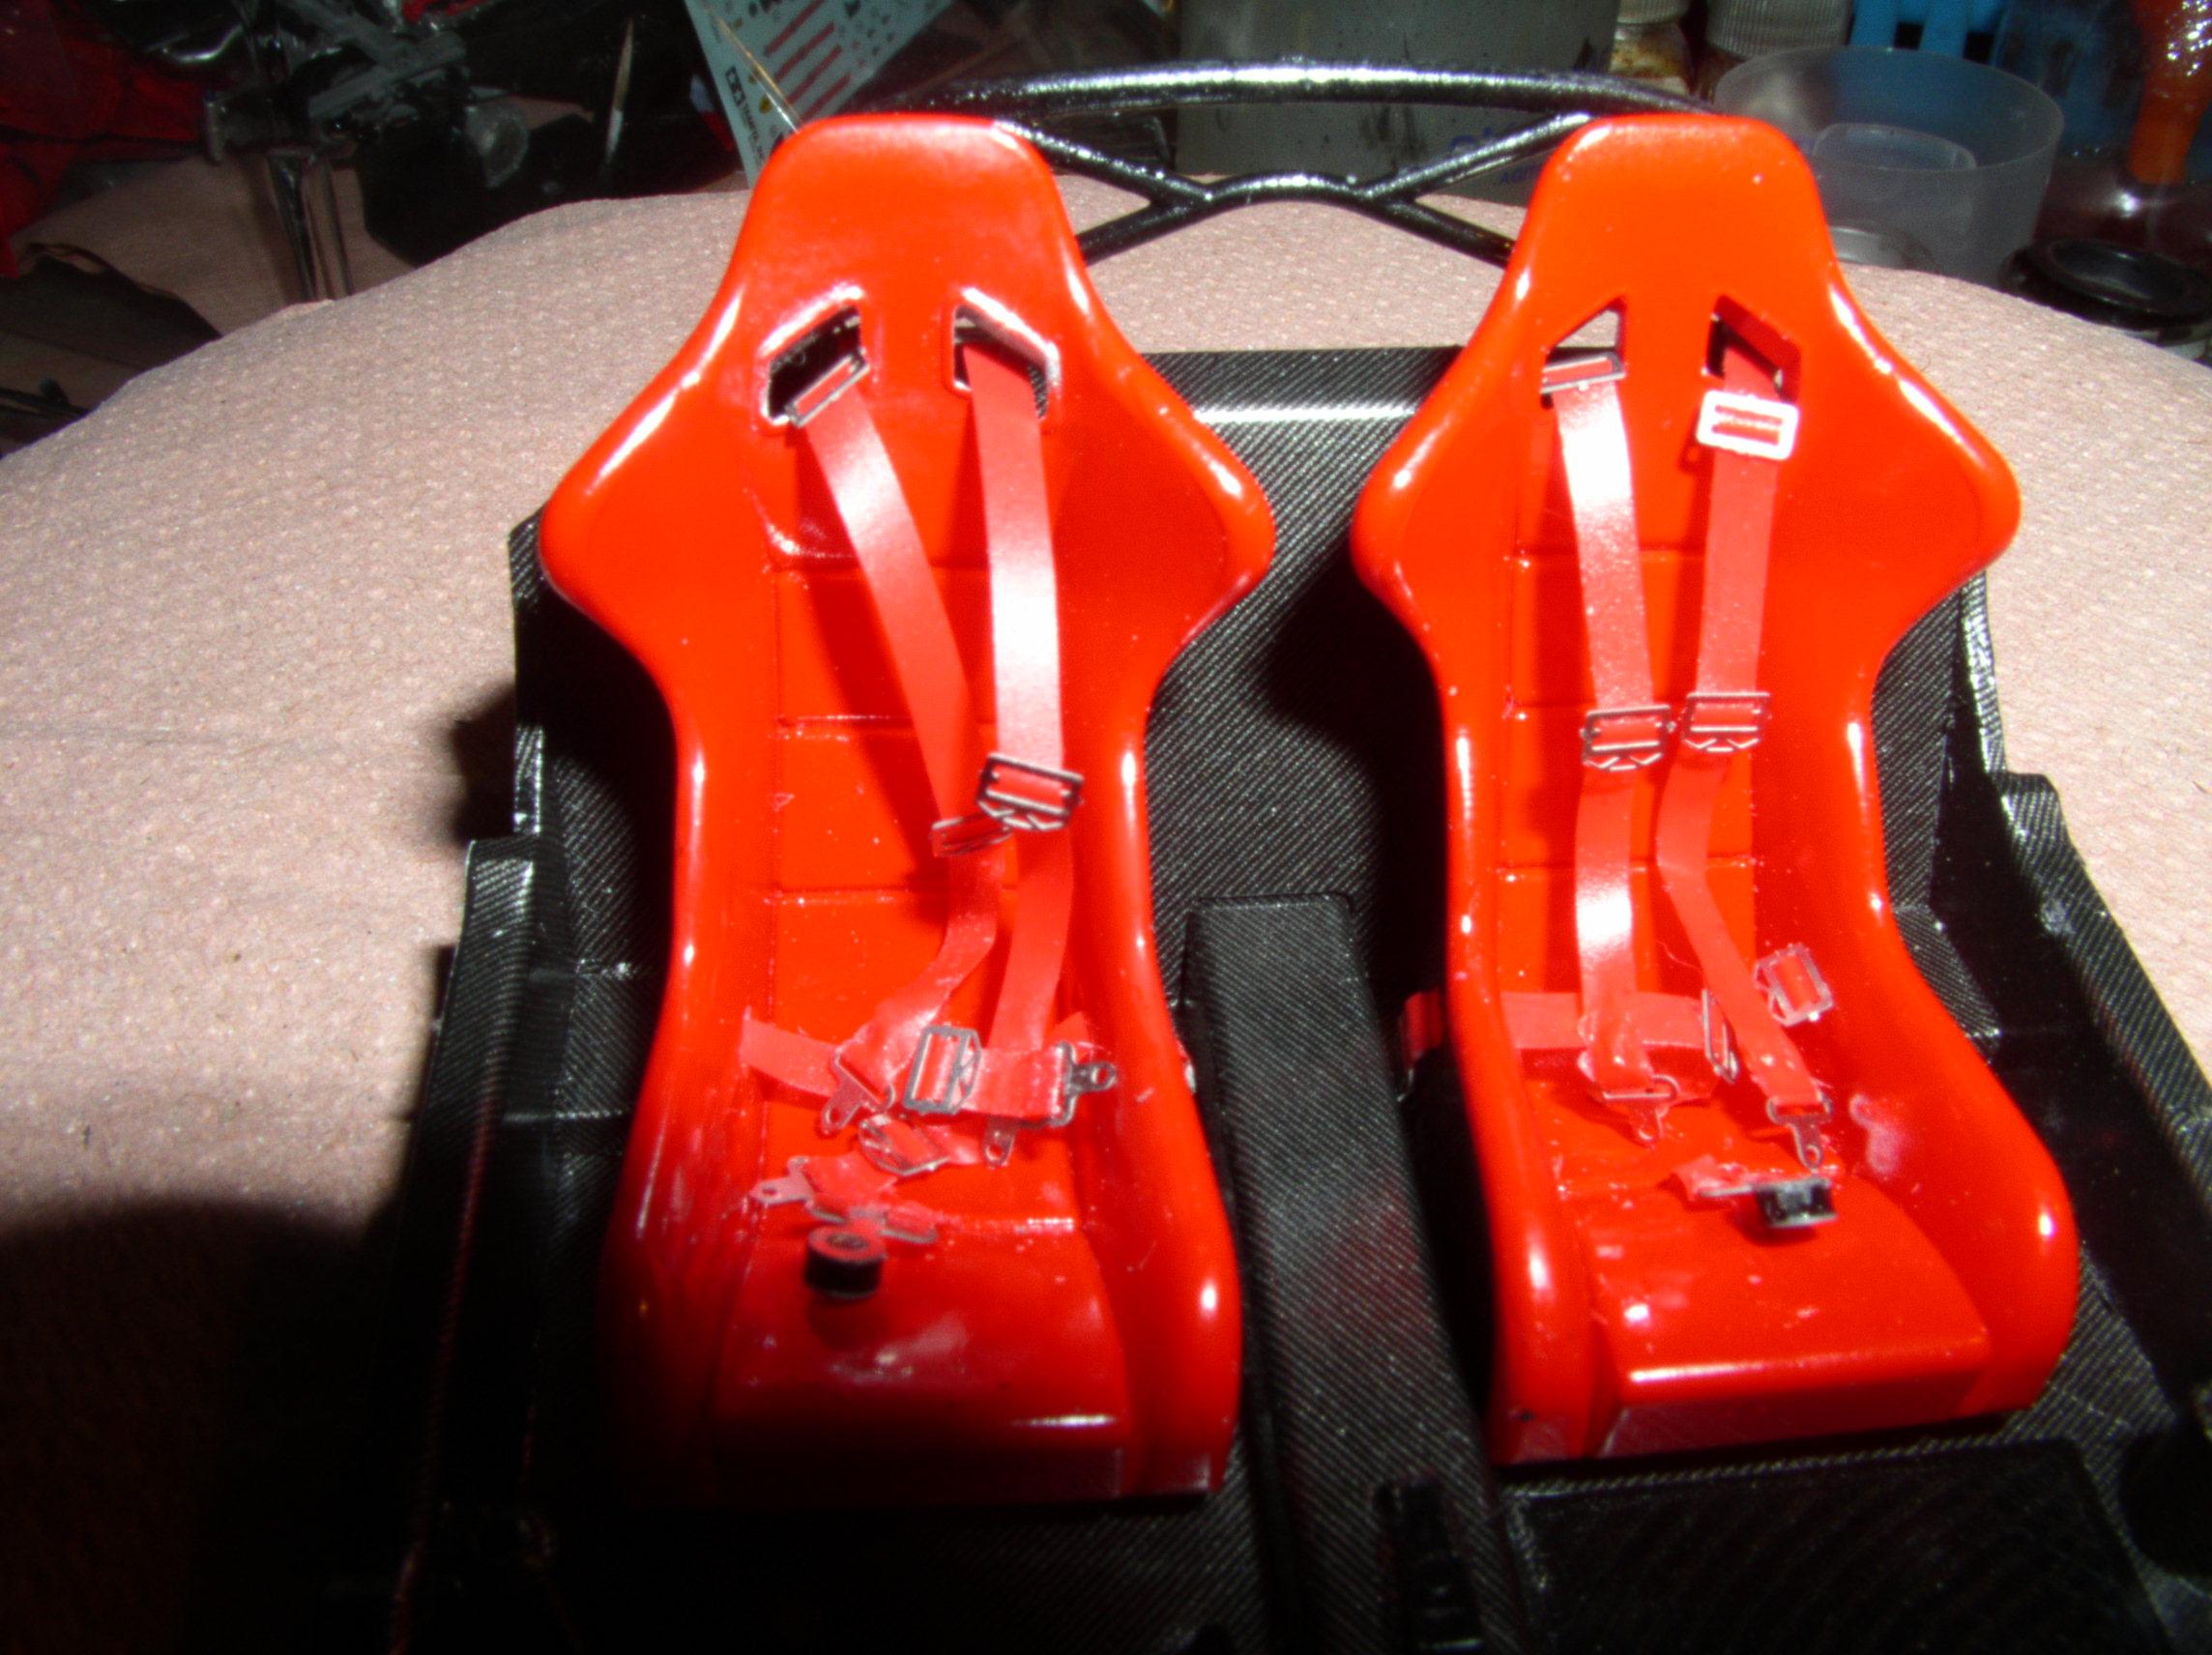 Ferrari FXX ...Tamiya 1/24... Reprise du montage !!!!!! Fxx4g